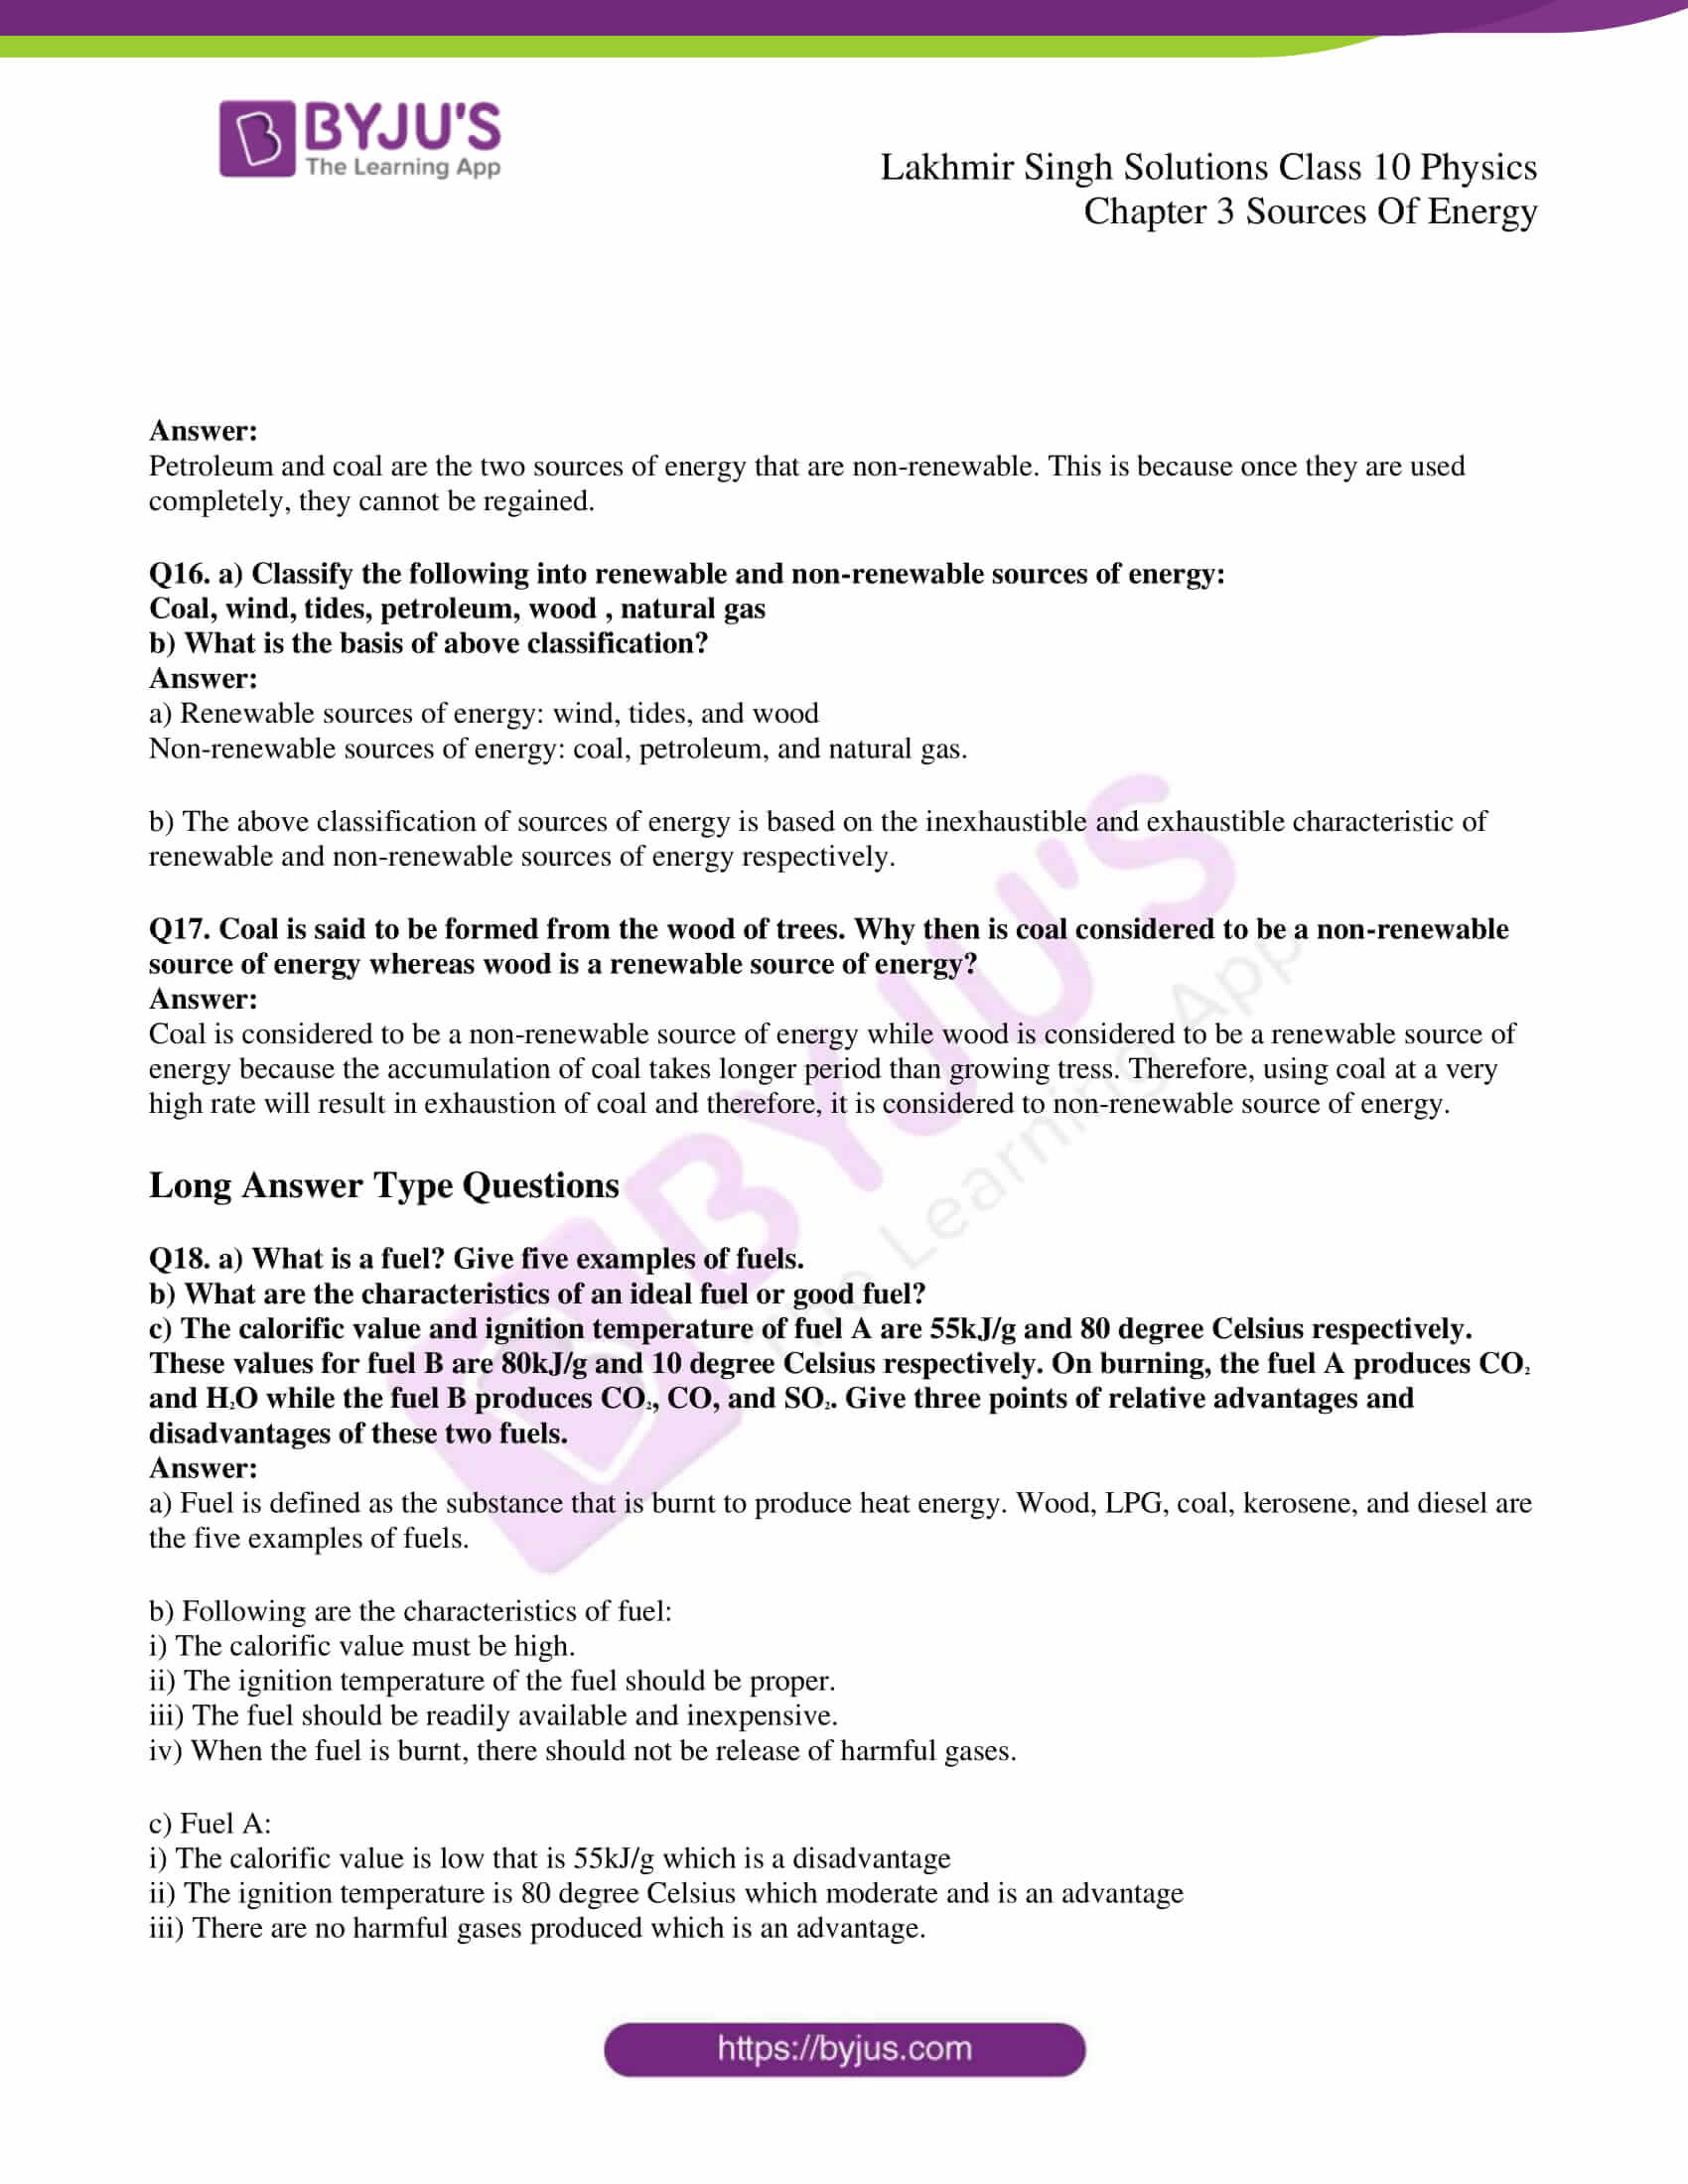 lakhmir singh sol class 10 physics chapter 3 03